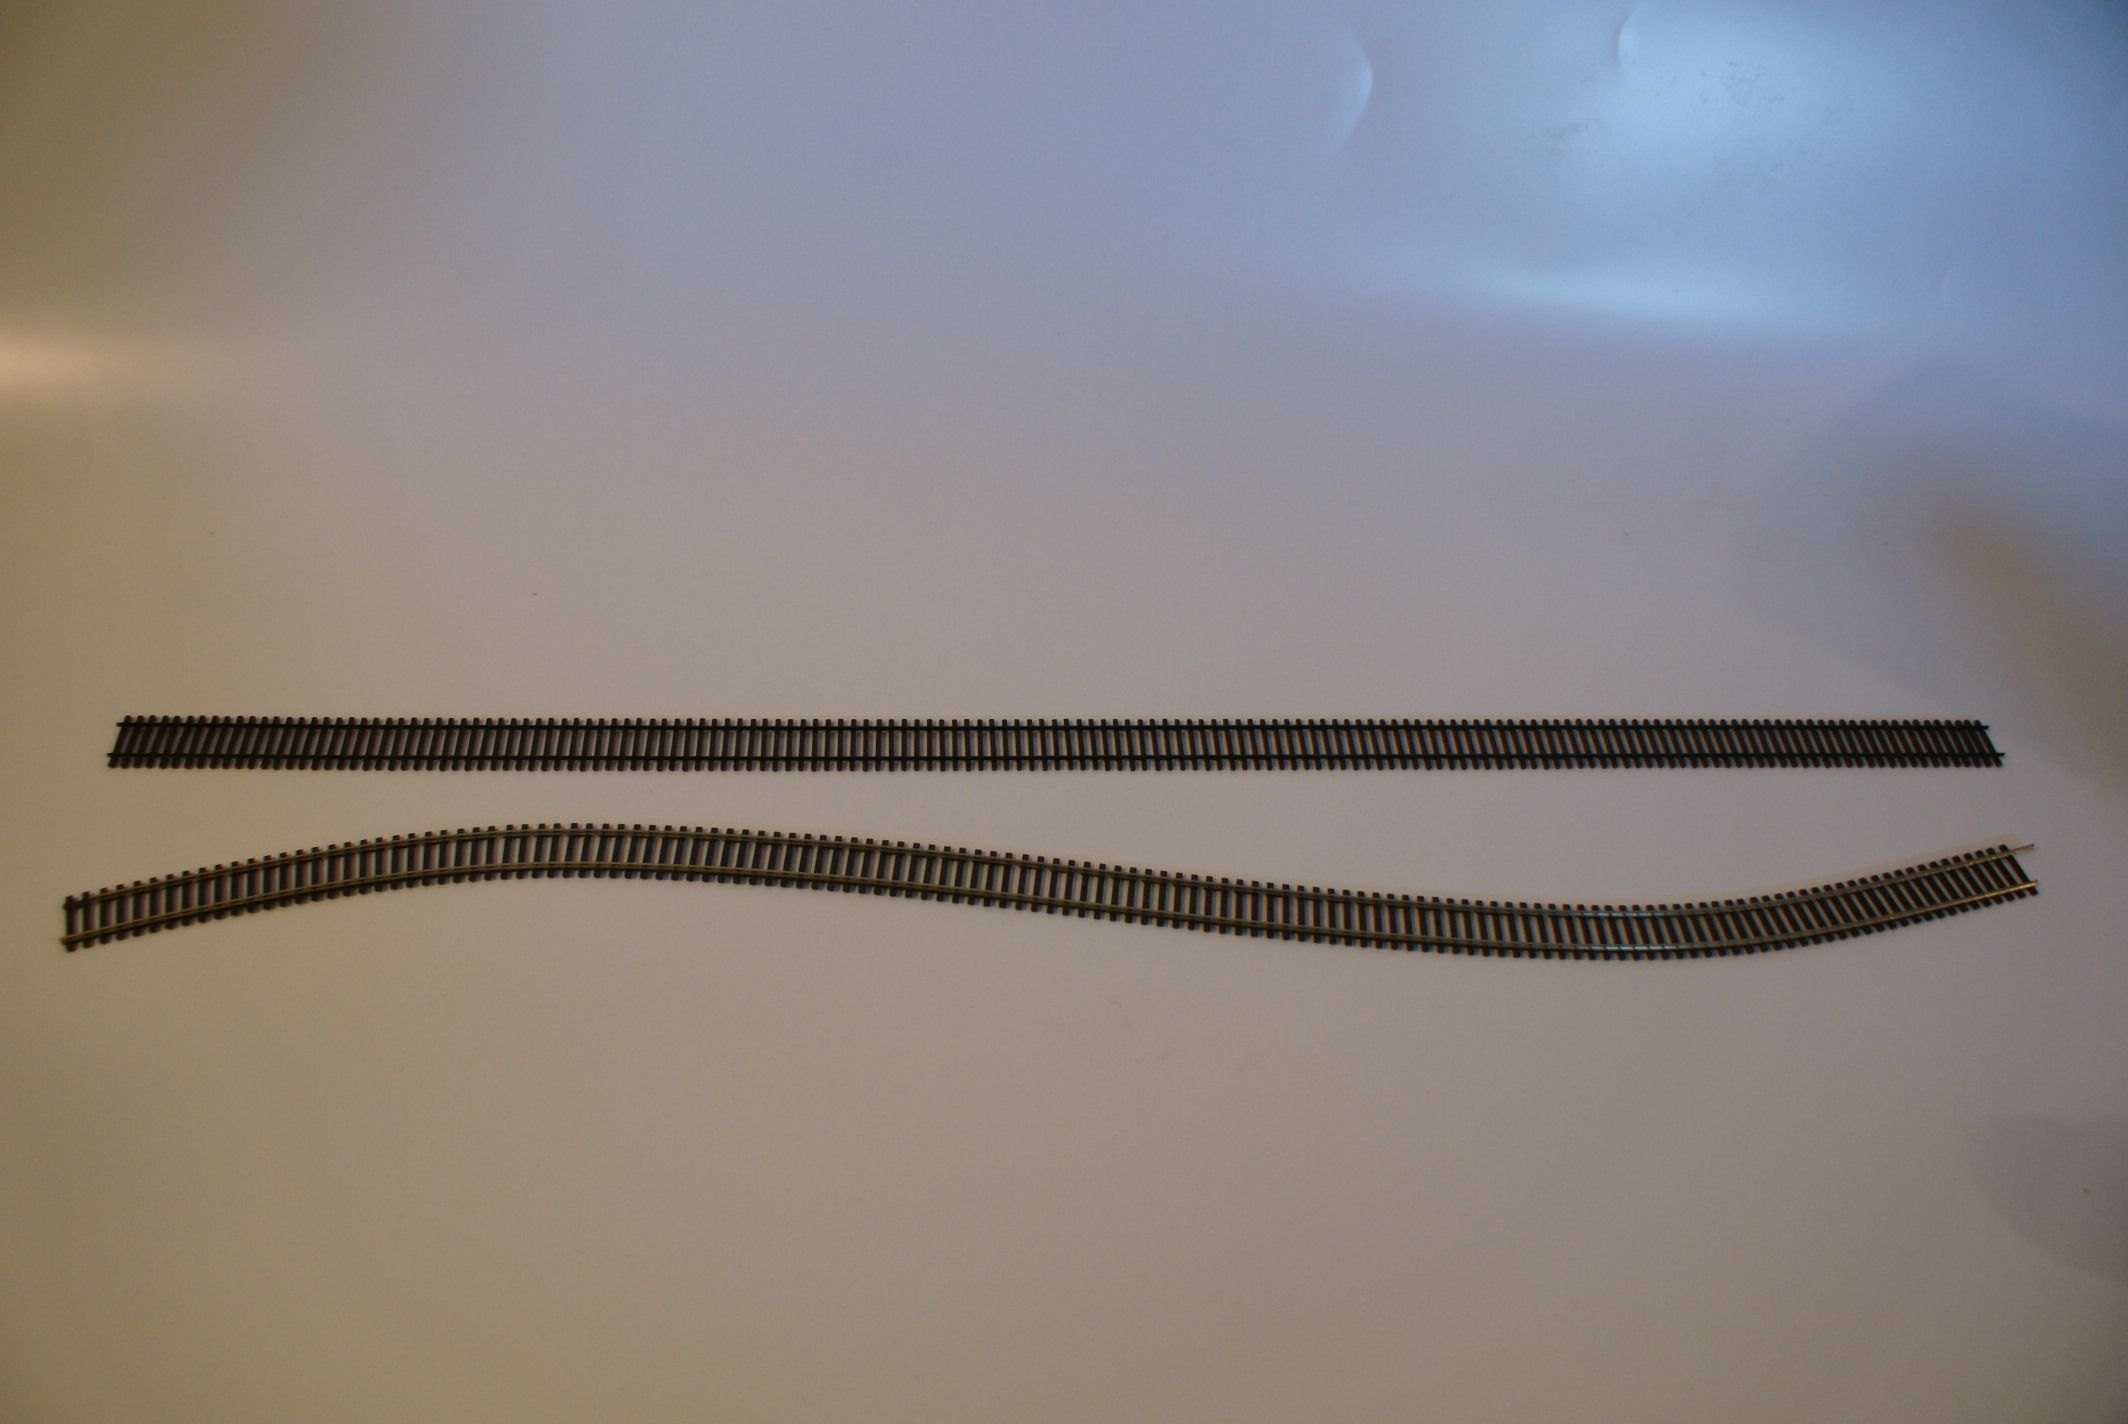 Model train flex track